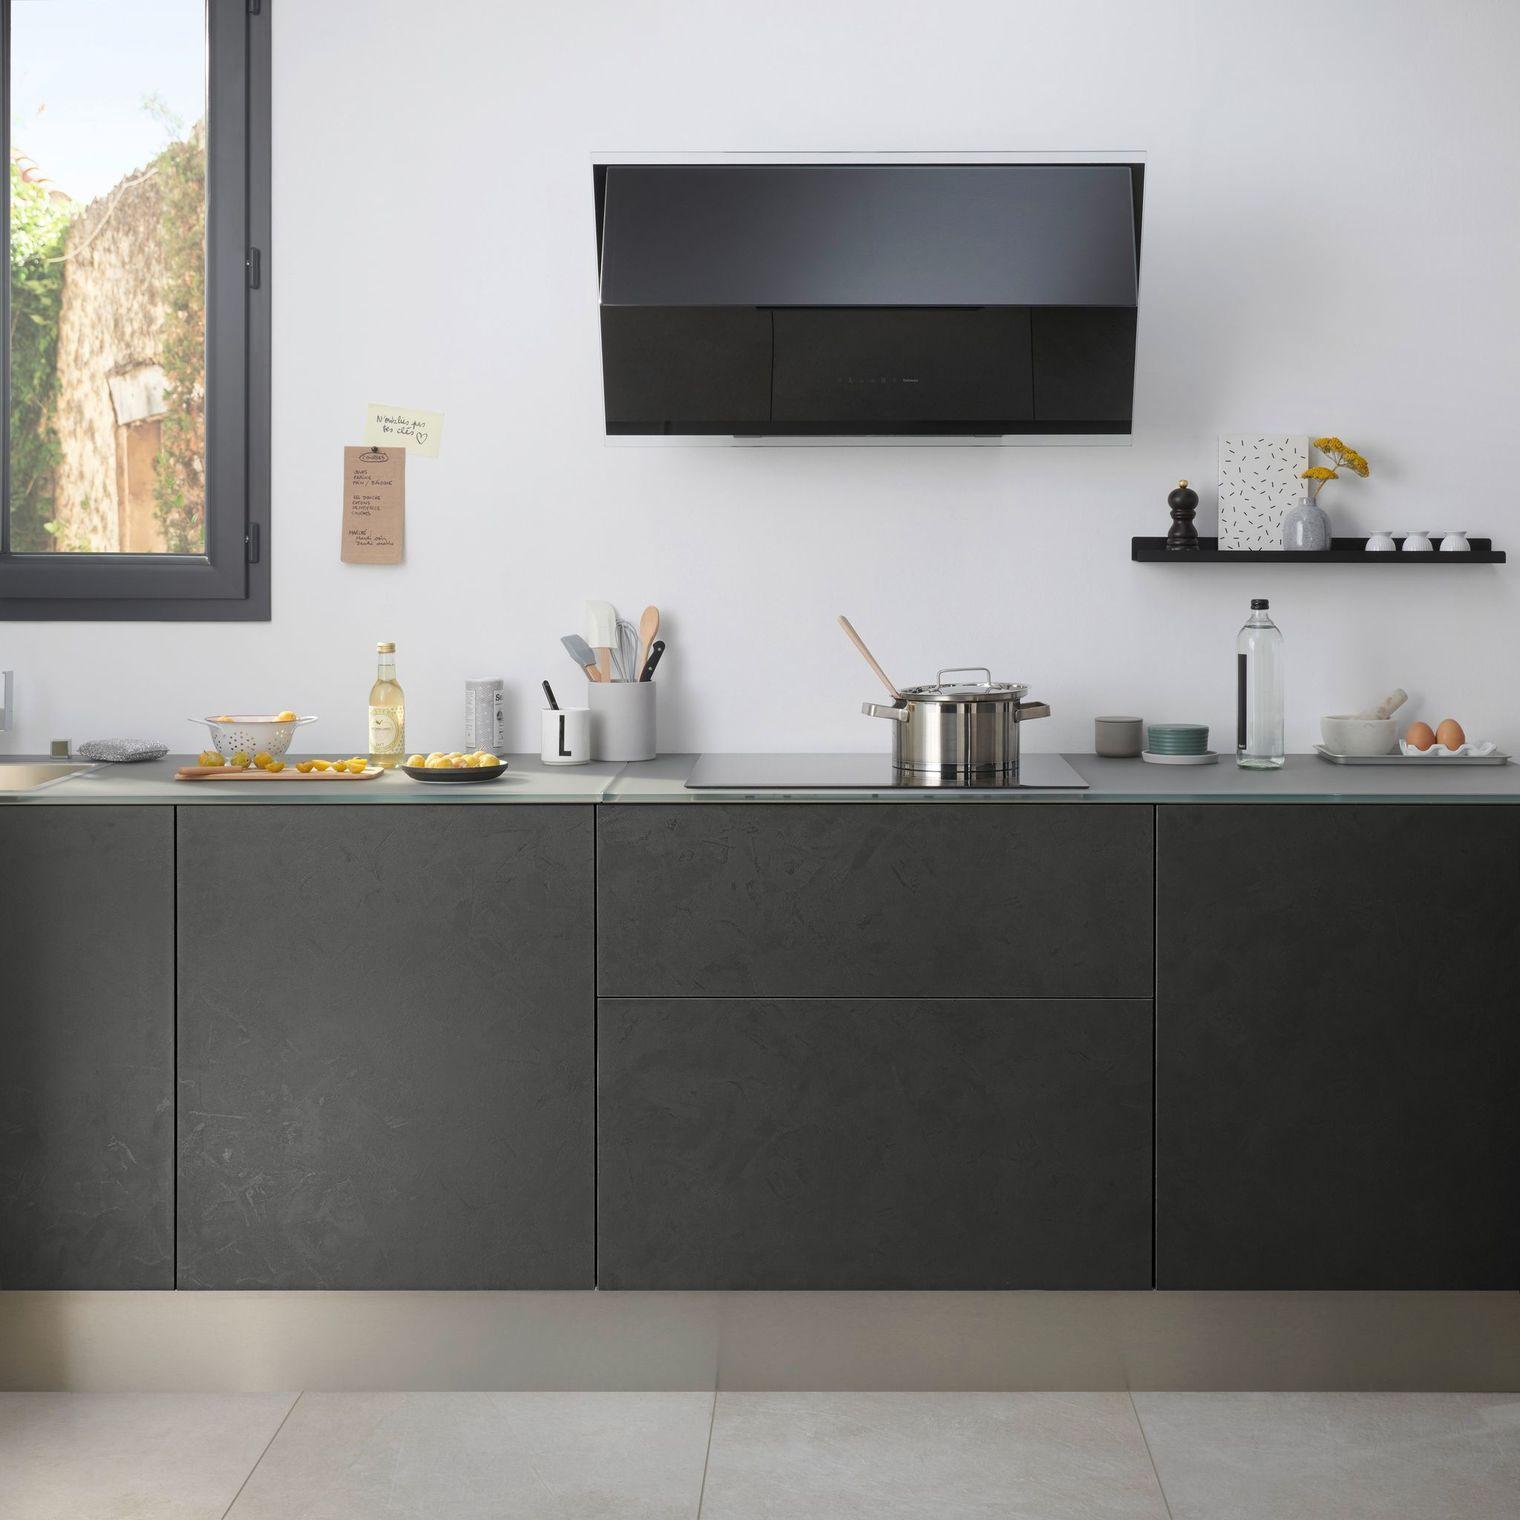 Meuble Cuisine Ikea Vide Sanitaire meuble cuisine : conseils pour les choisir | meuble cuisine